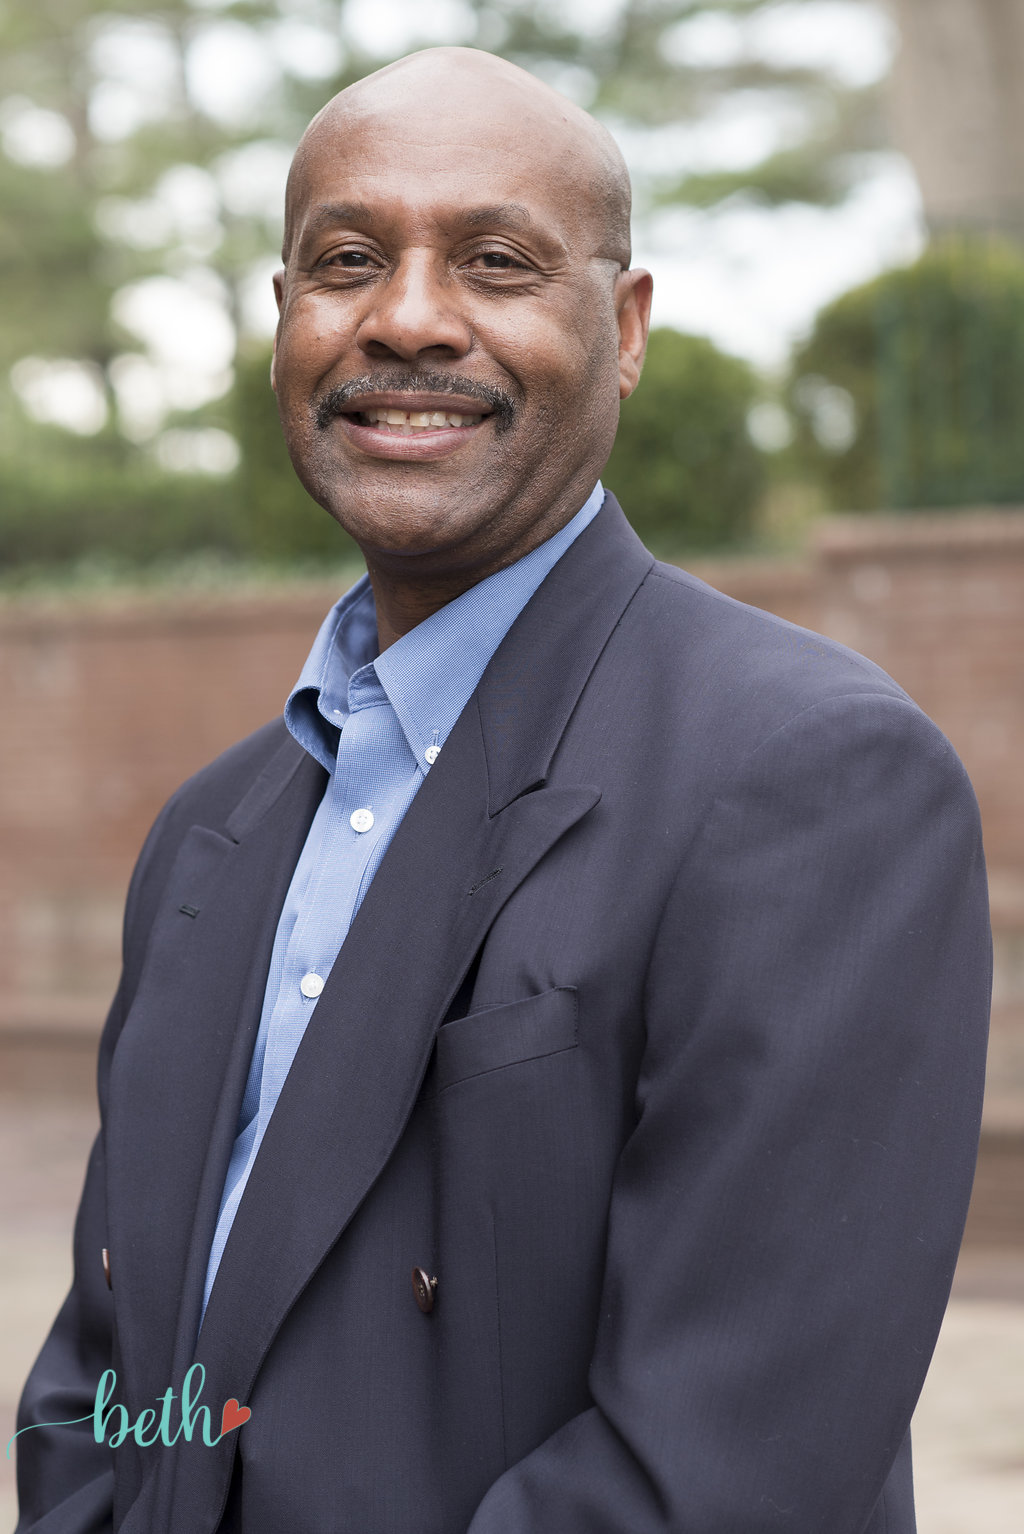 Keith Conley, Custom Benefits Solutions' Enrollment Specialist